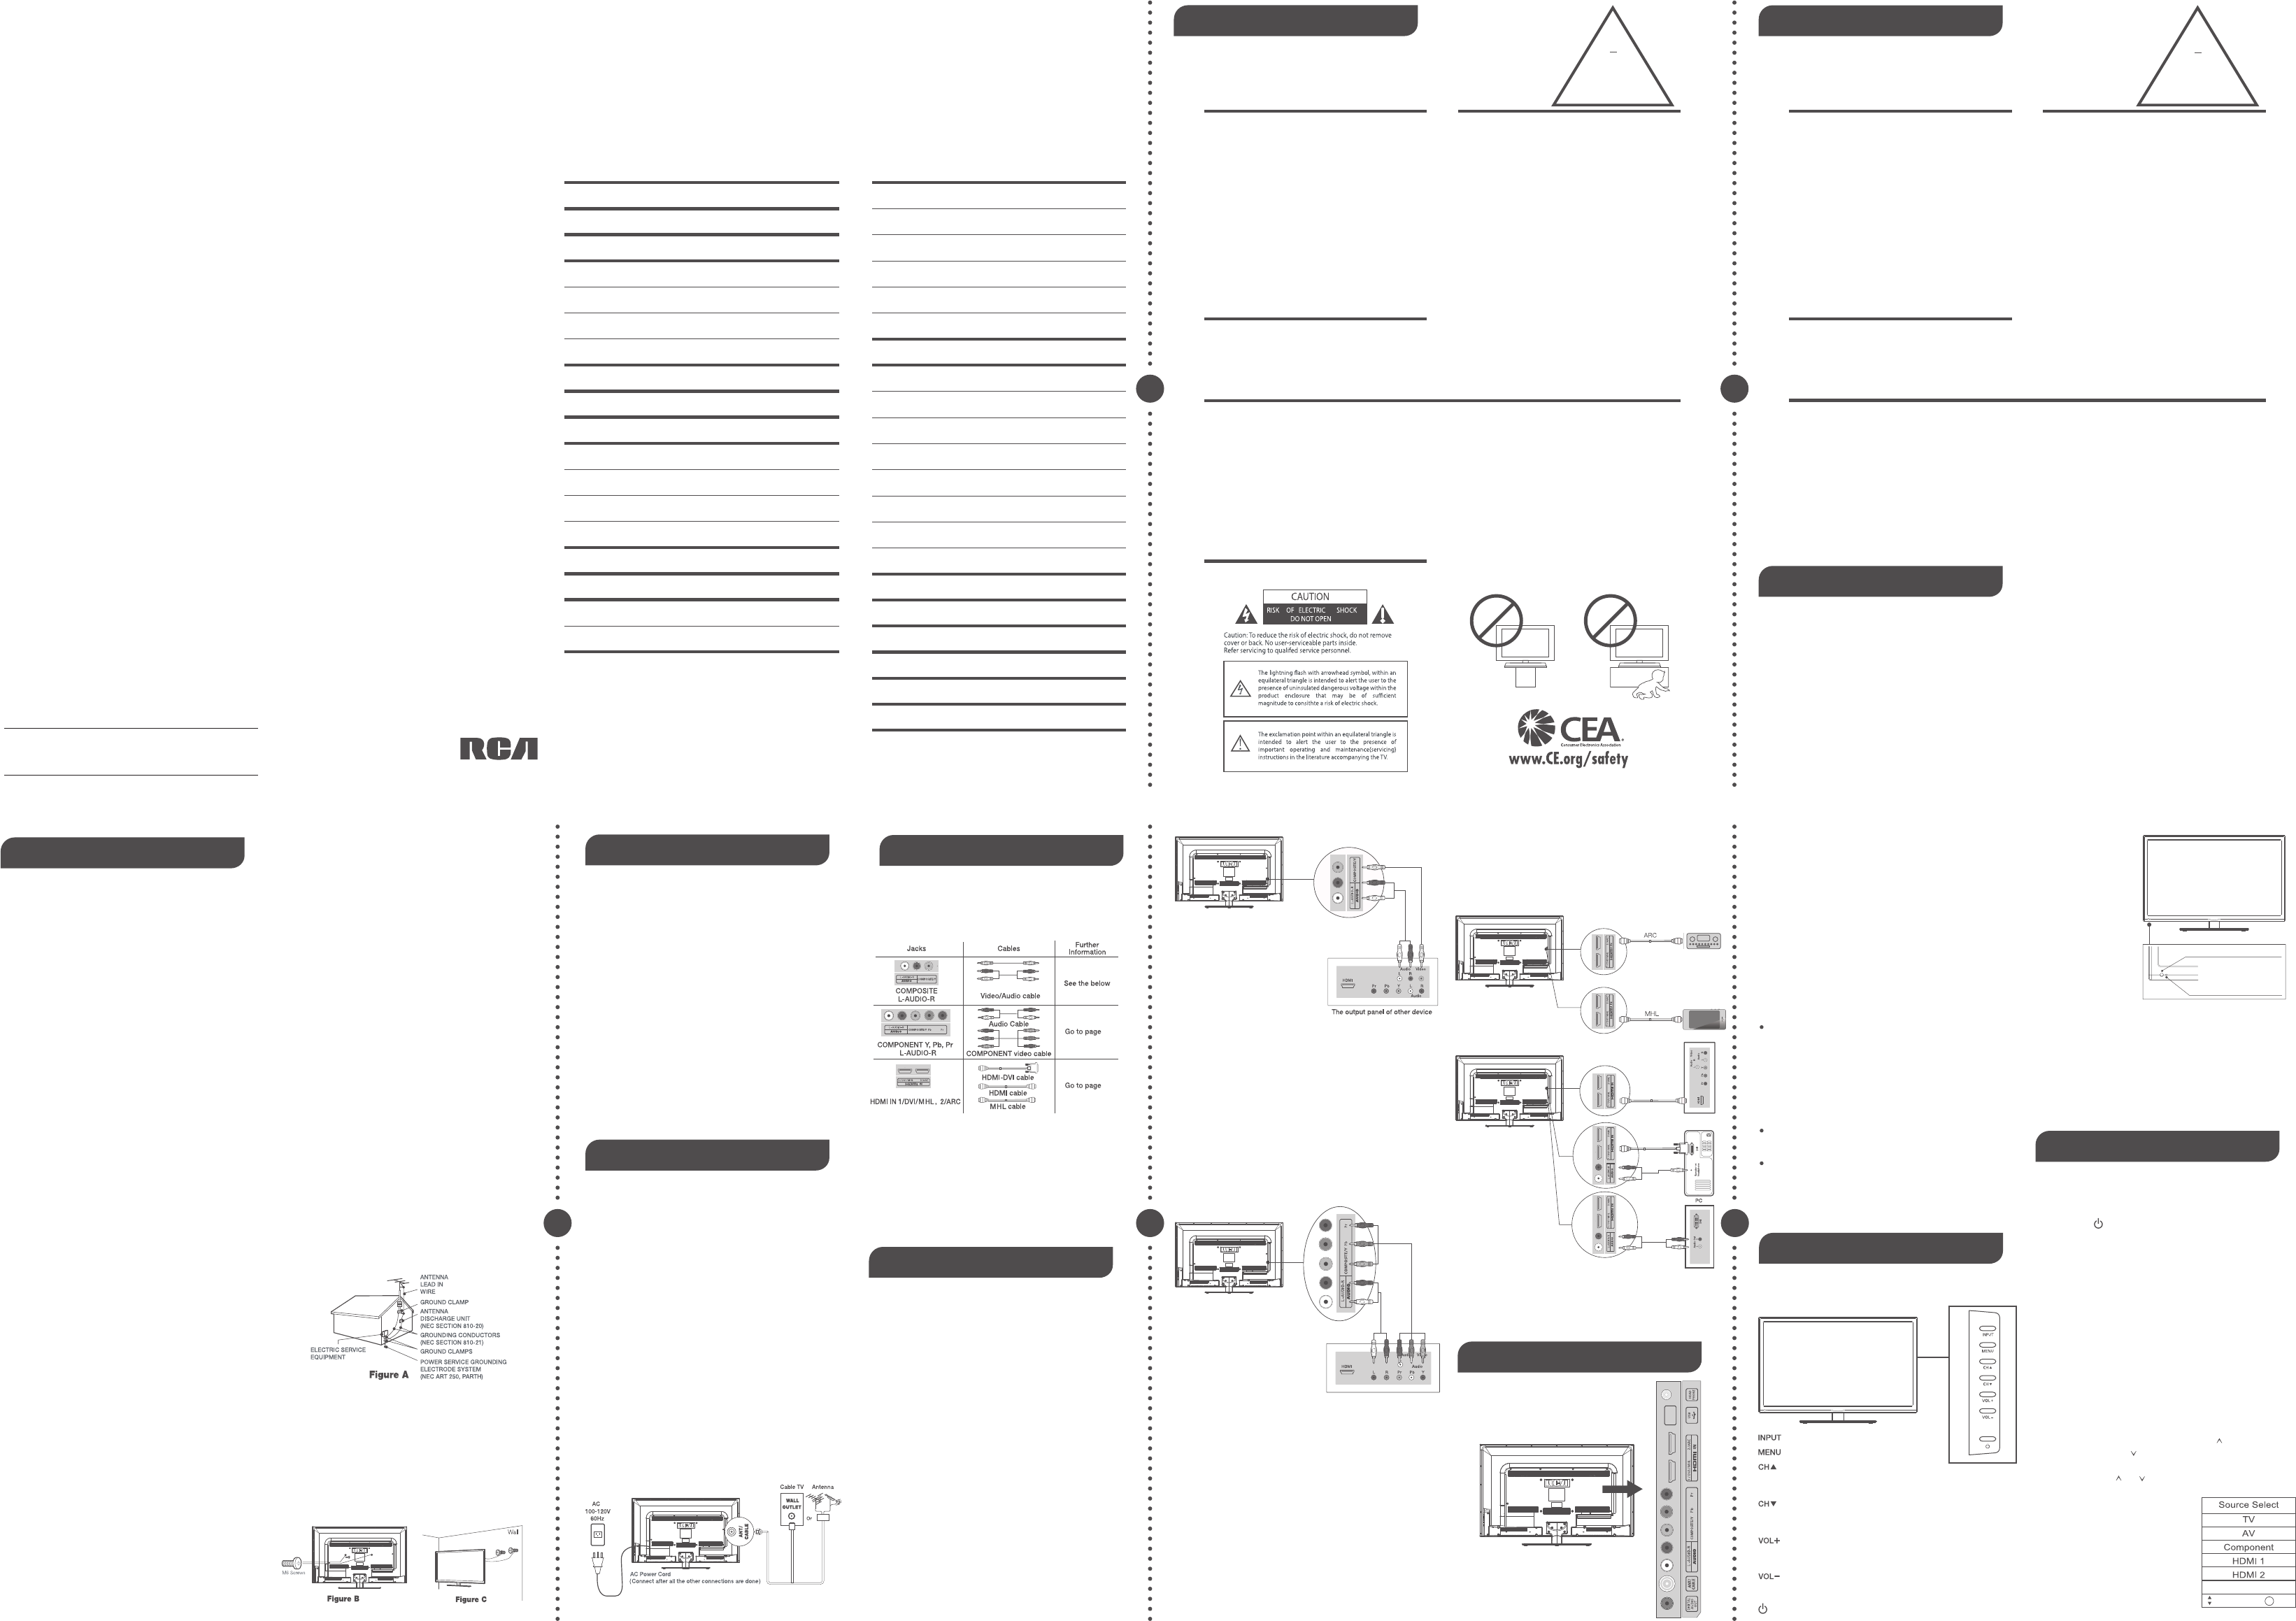 Rca Led42C45Rq Users Manual UM RN0342R0121 D42RWA01 D030709 on